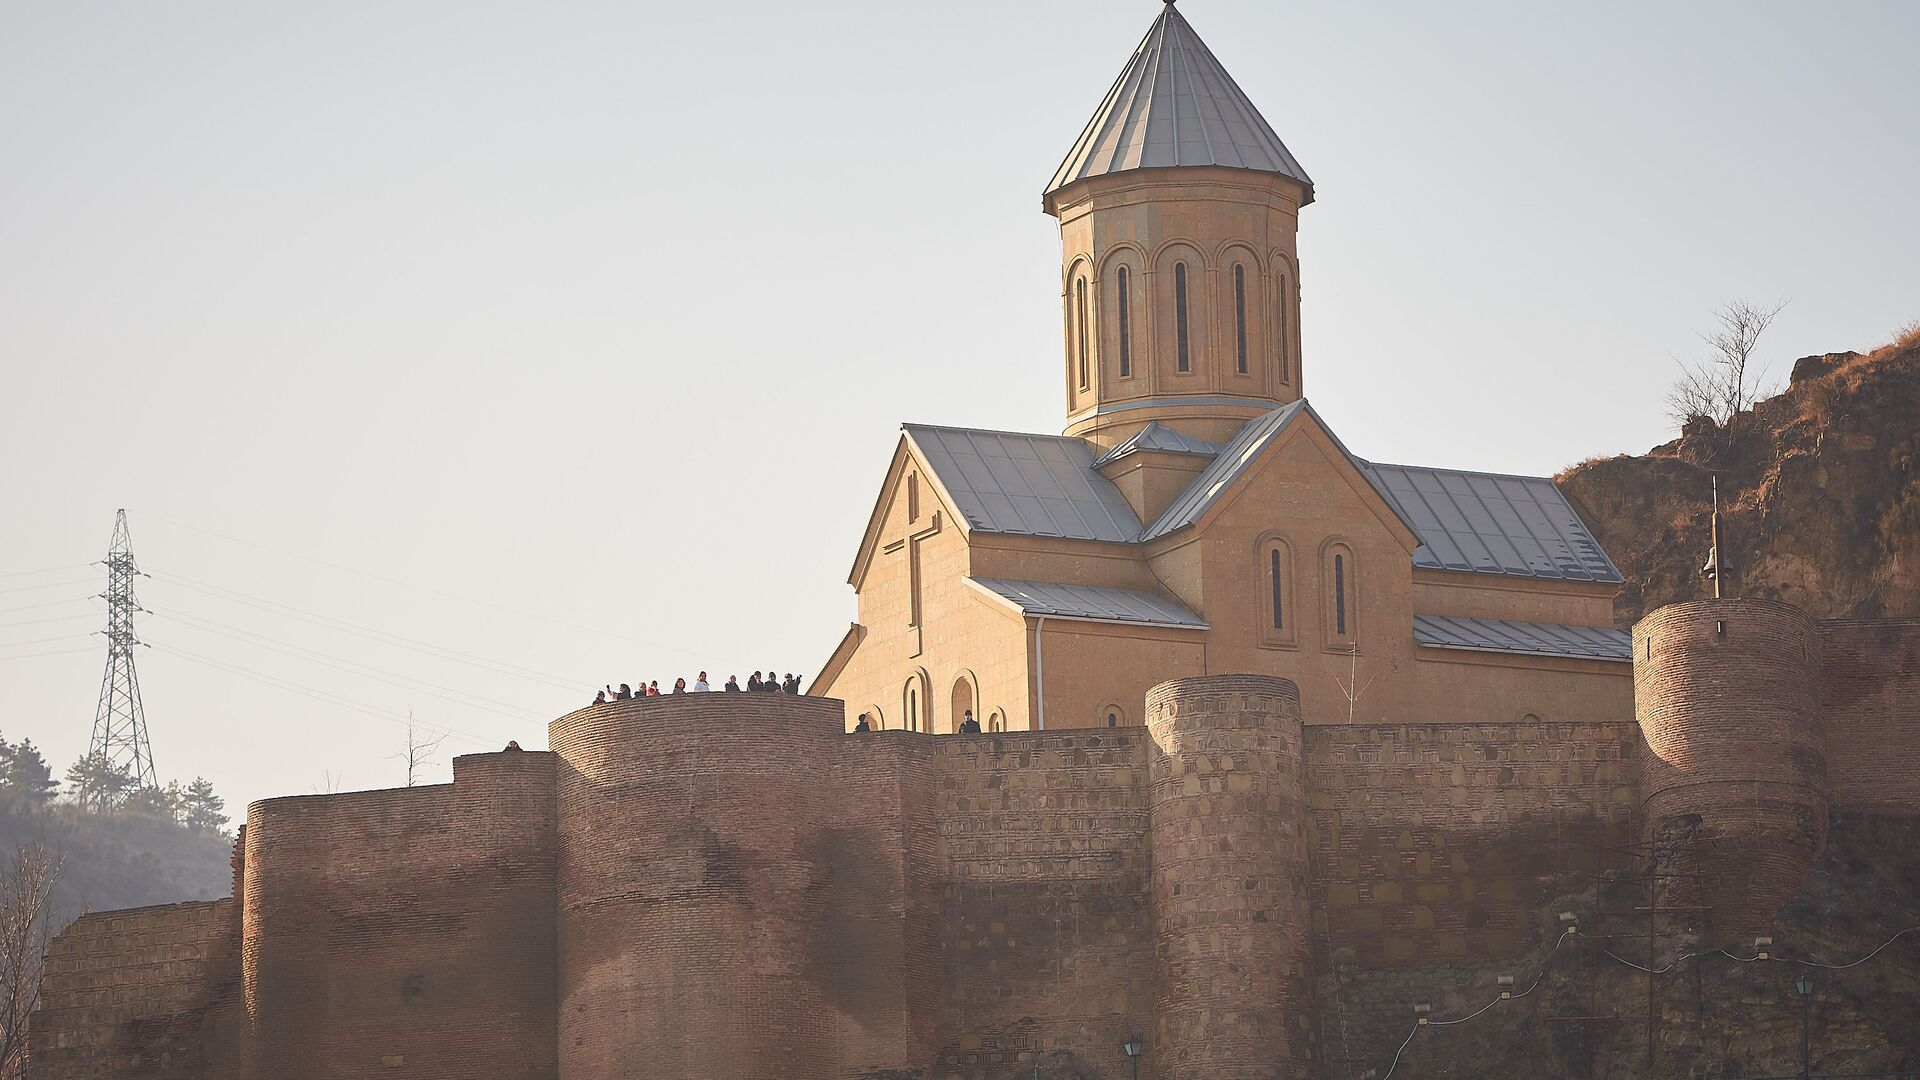 Церковь Святого Николая на территории крепости Нарикала - Sputnik Грузия, 1920, 12.09.2021